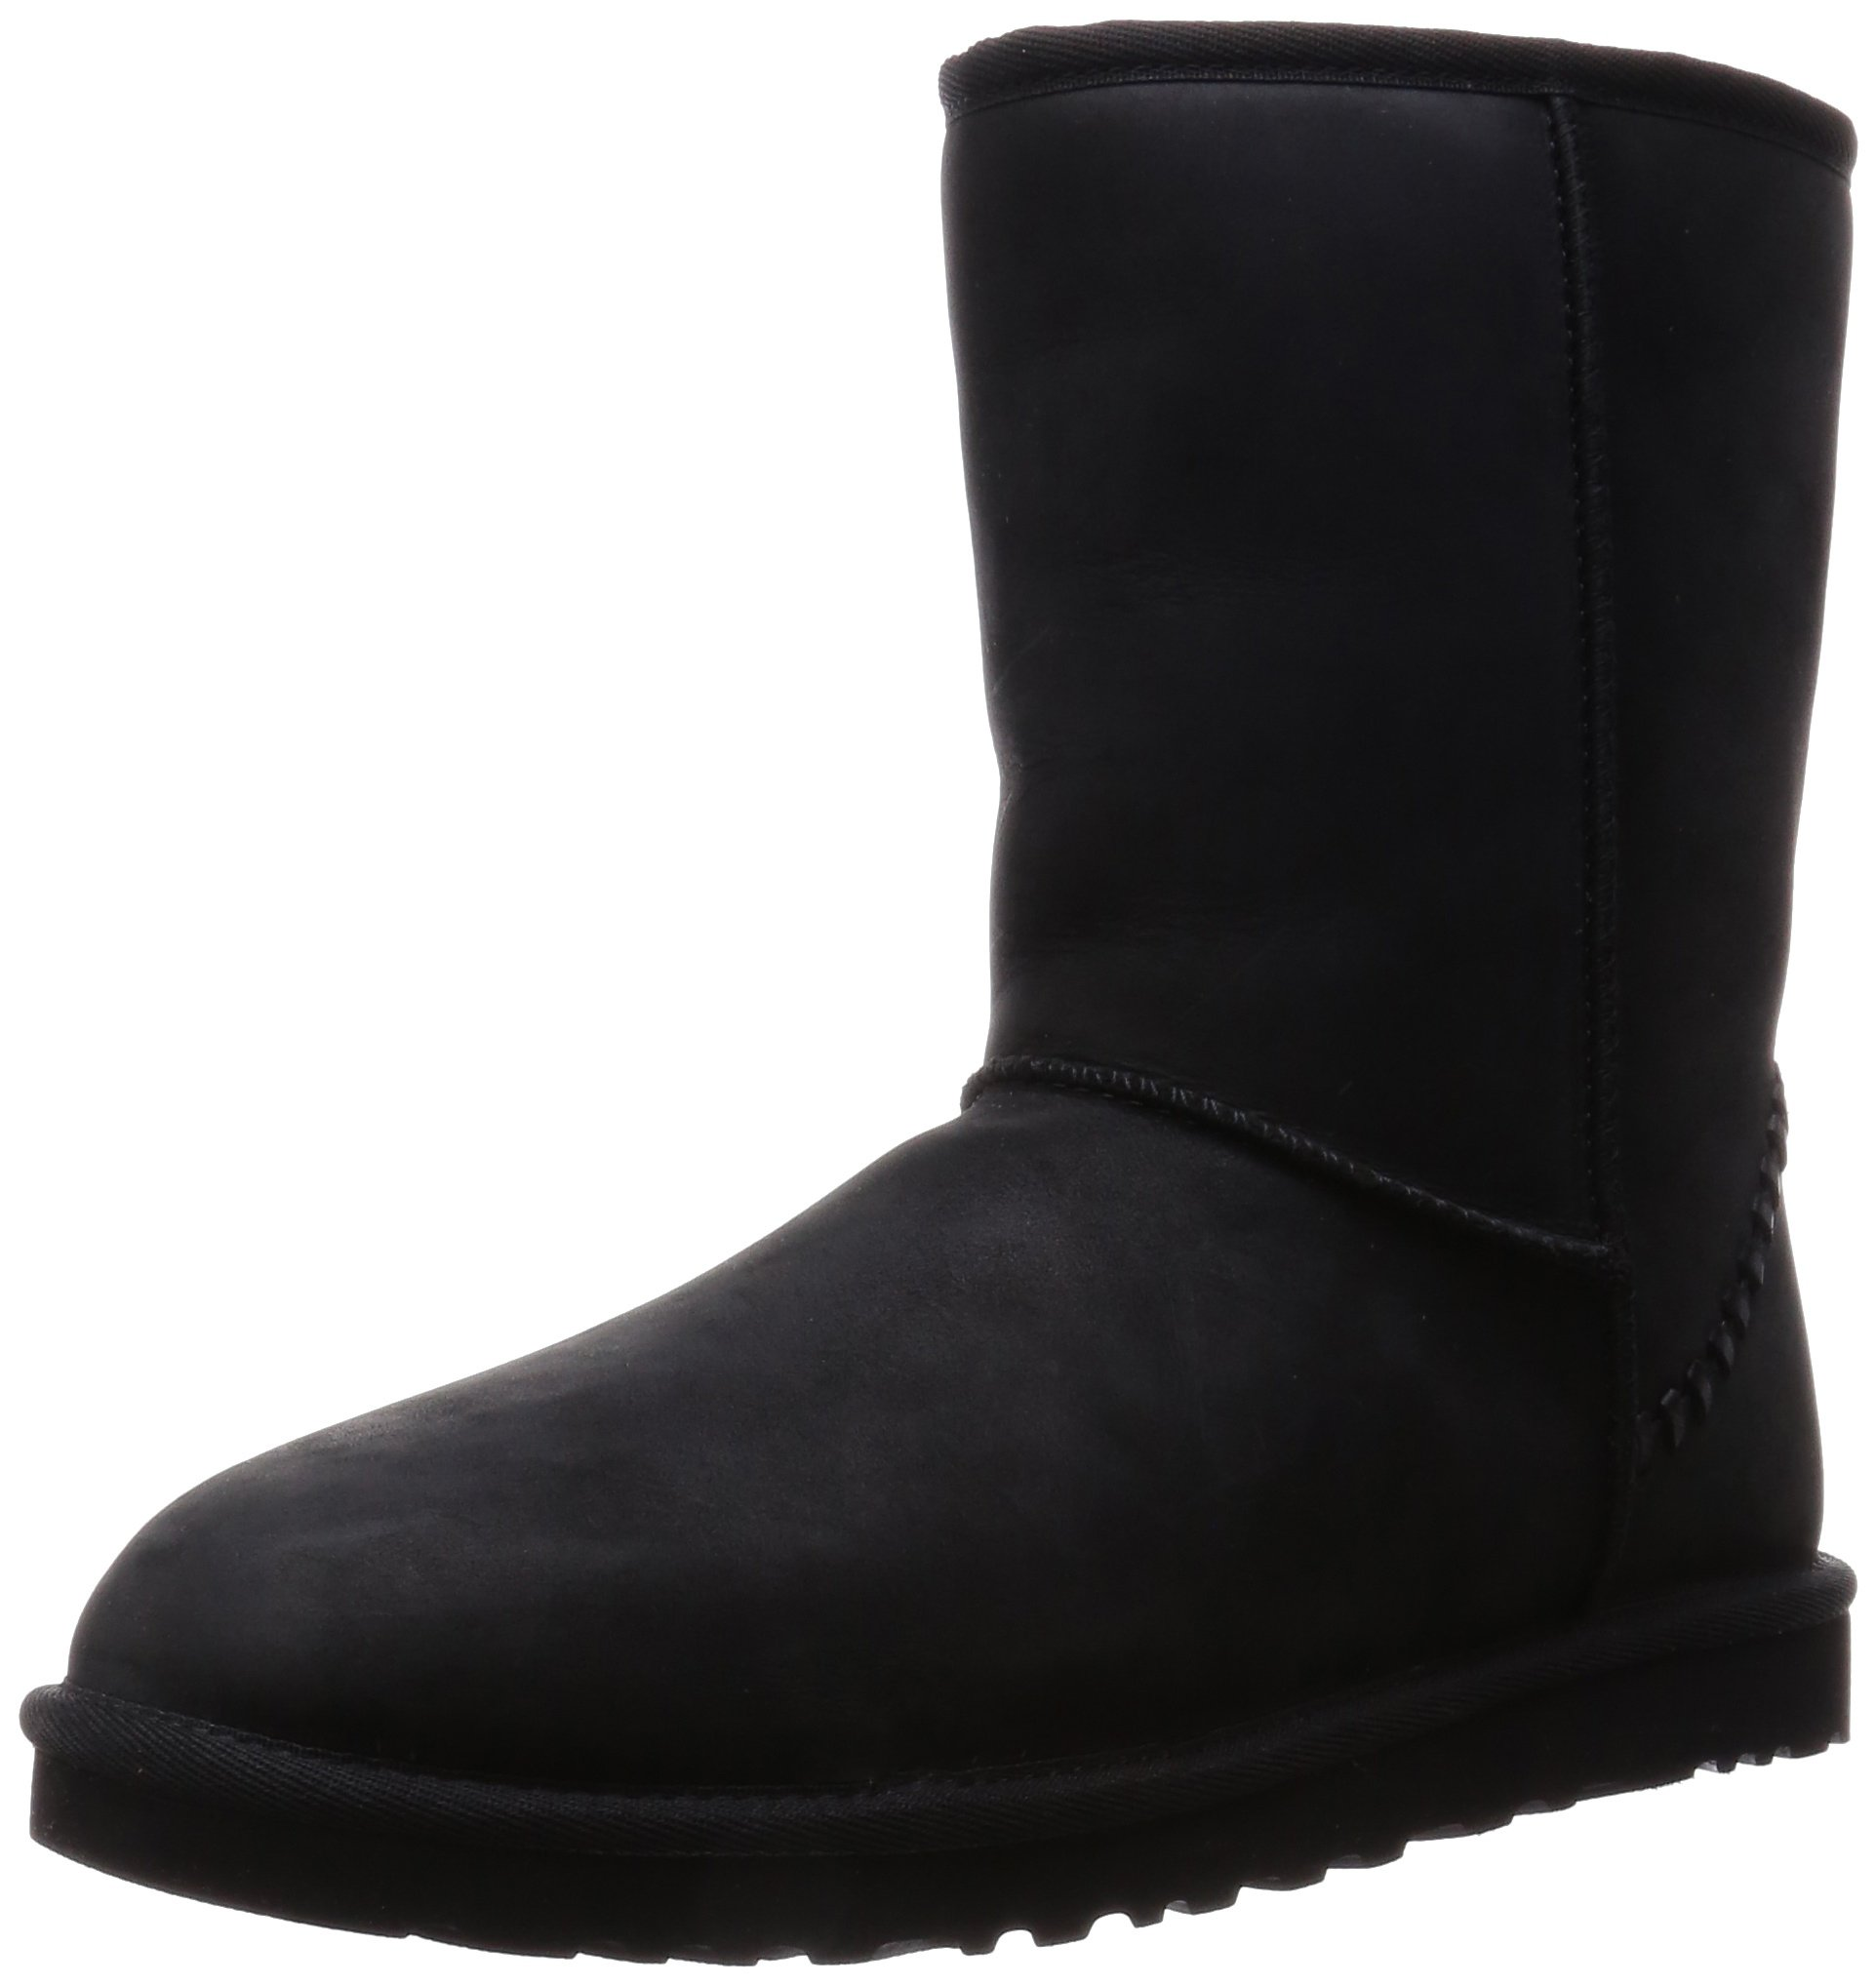 UGG Men's Classic Short Deco Black Leather 8 D US